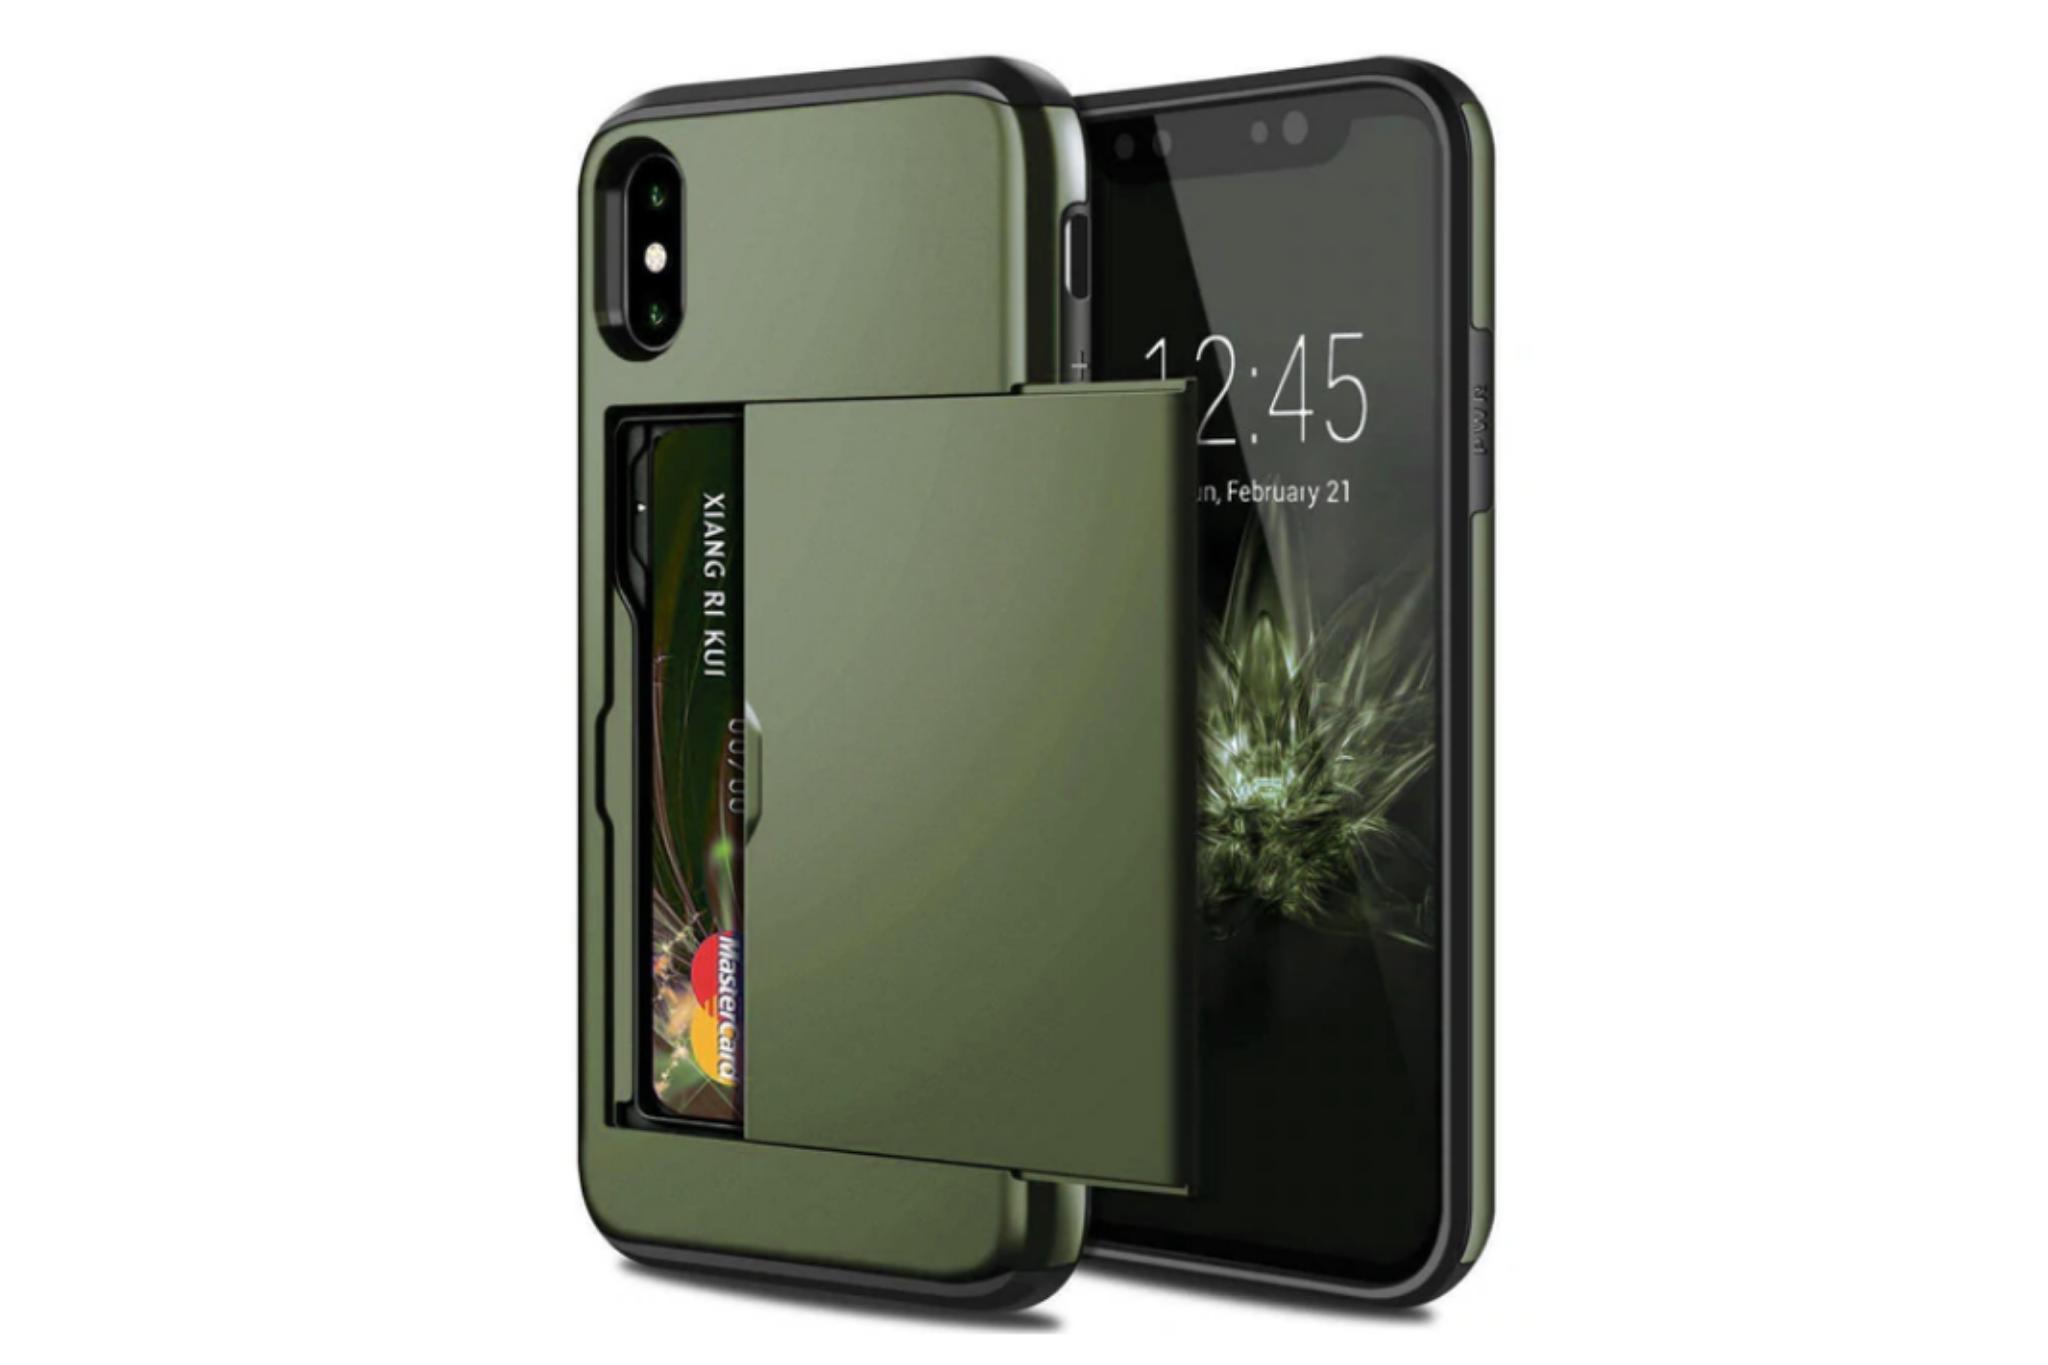 Smartphonehoesje iPhone 7 plus / 8 plus | Pasjesschuif groen